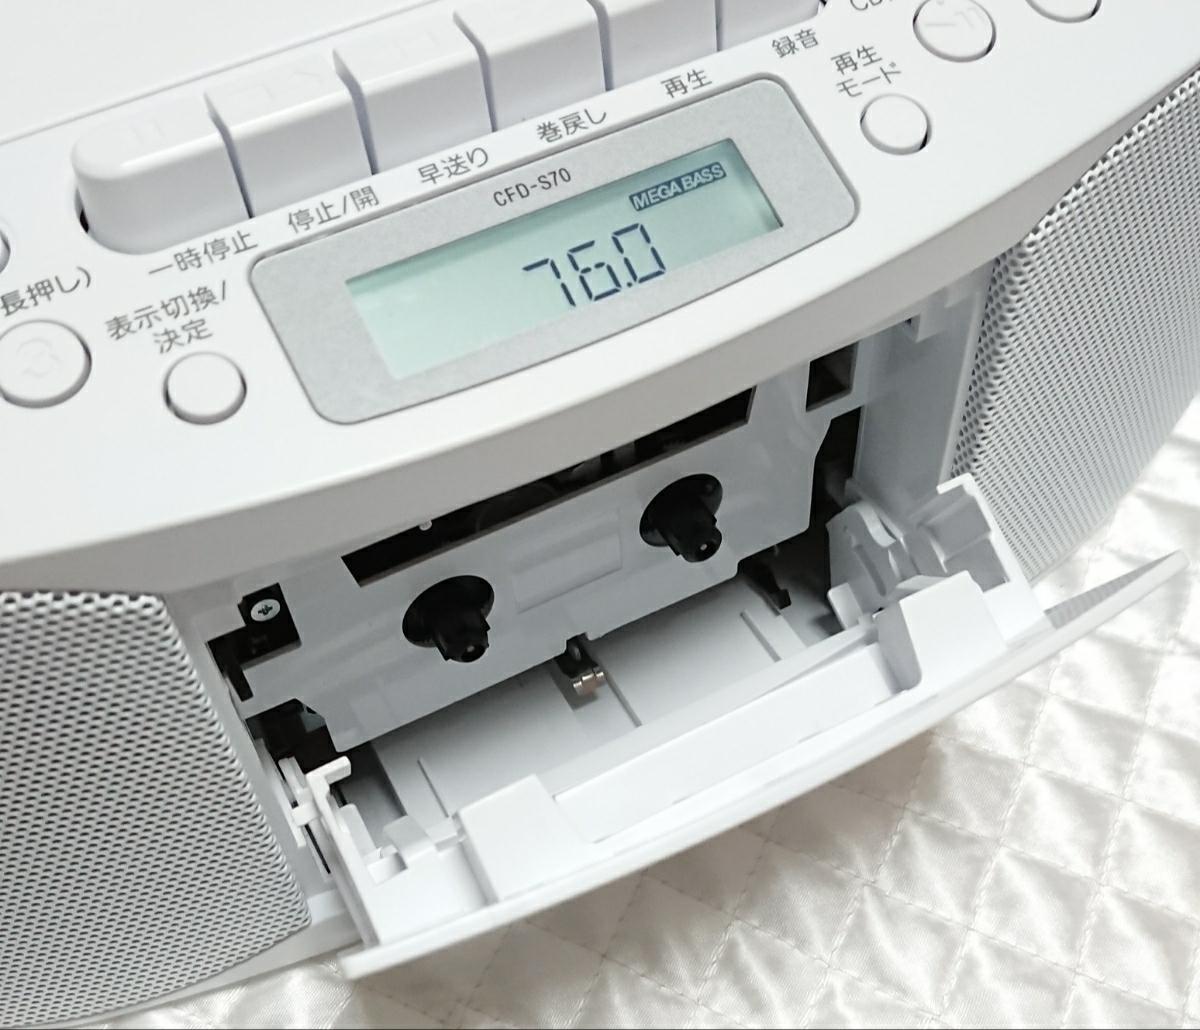 《SONY/ソニー》CFD-S70 18年製 CD/FM/AM/カセット CDラジカセ レコーダー_画像5